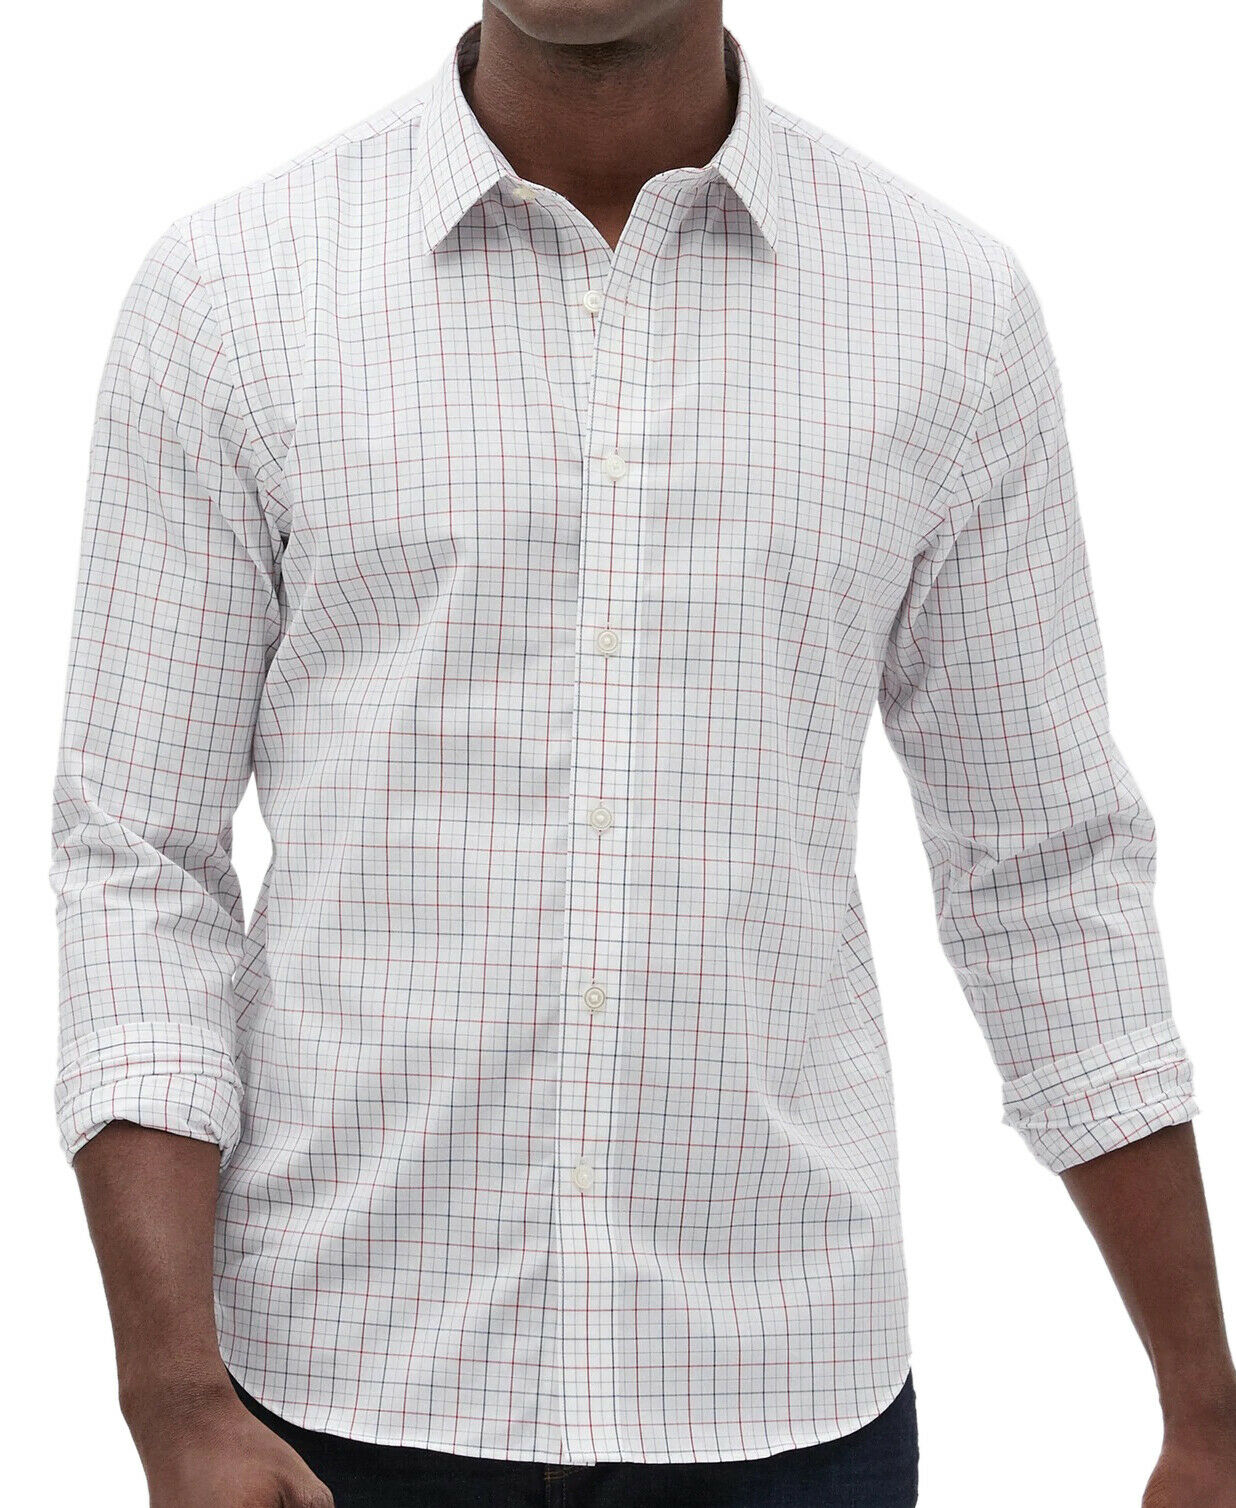 Banana Republic Men/'s Standard-Fit Non-Iron White Geo Print Shirt Size M NWT